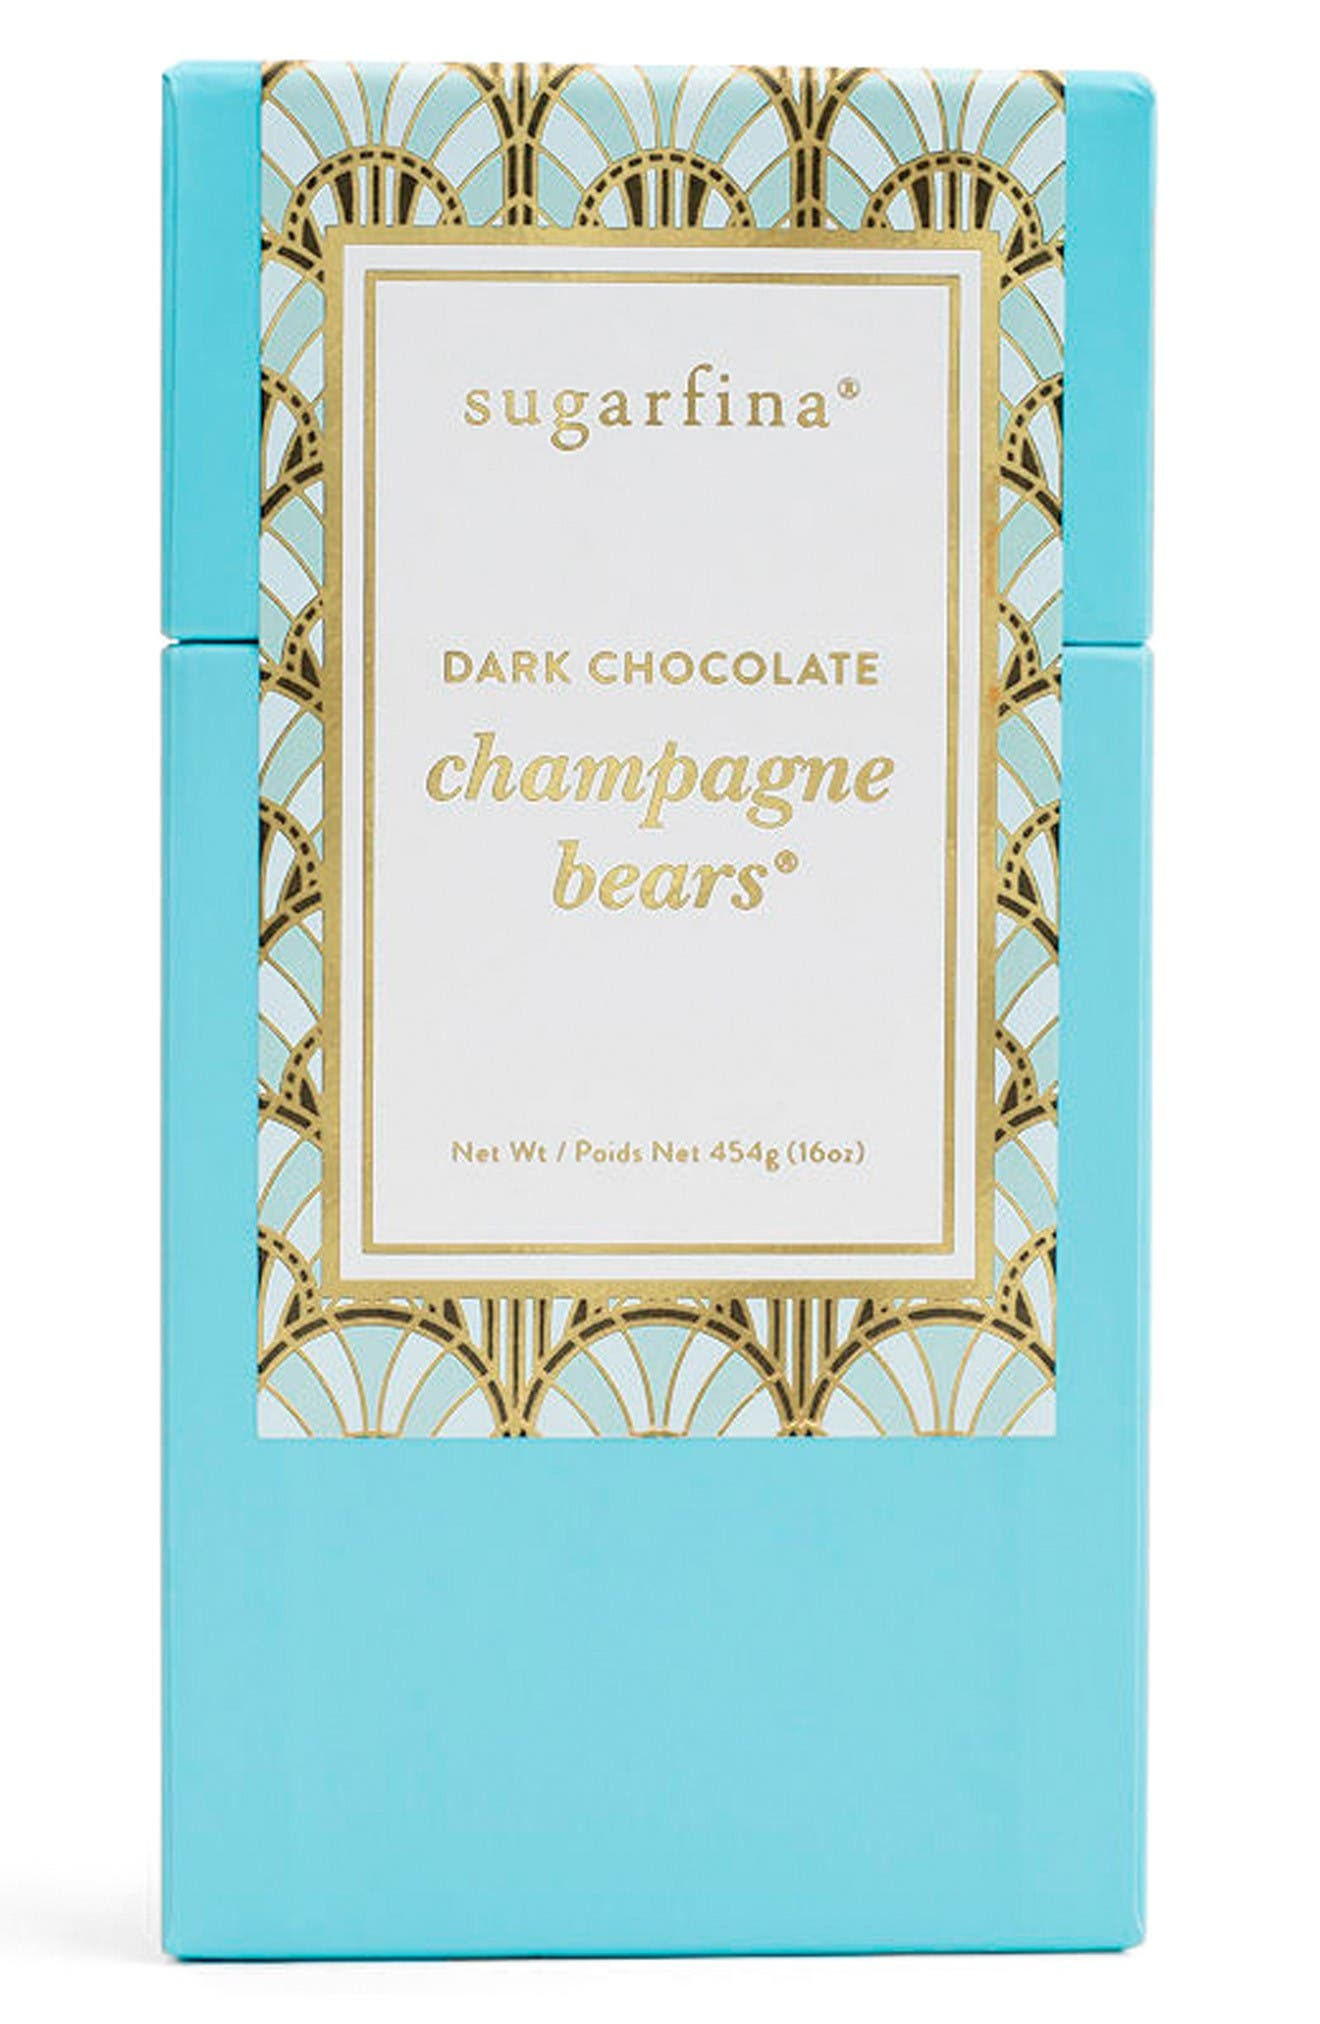 sugarfina Dark Chocolate Champagne Bears®